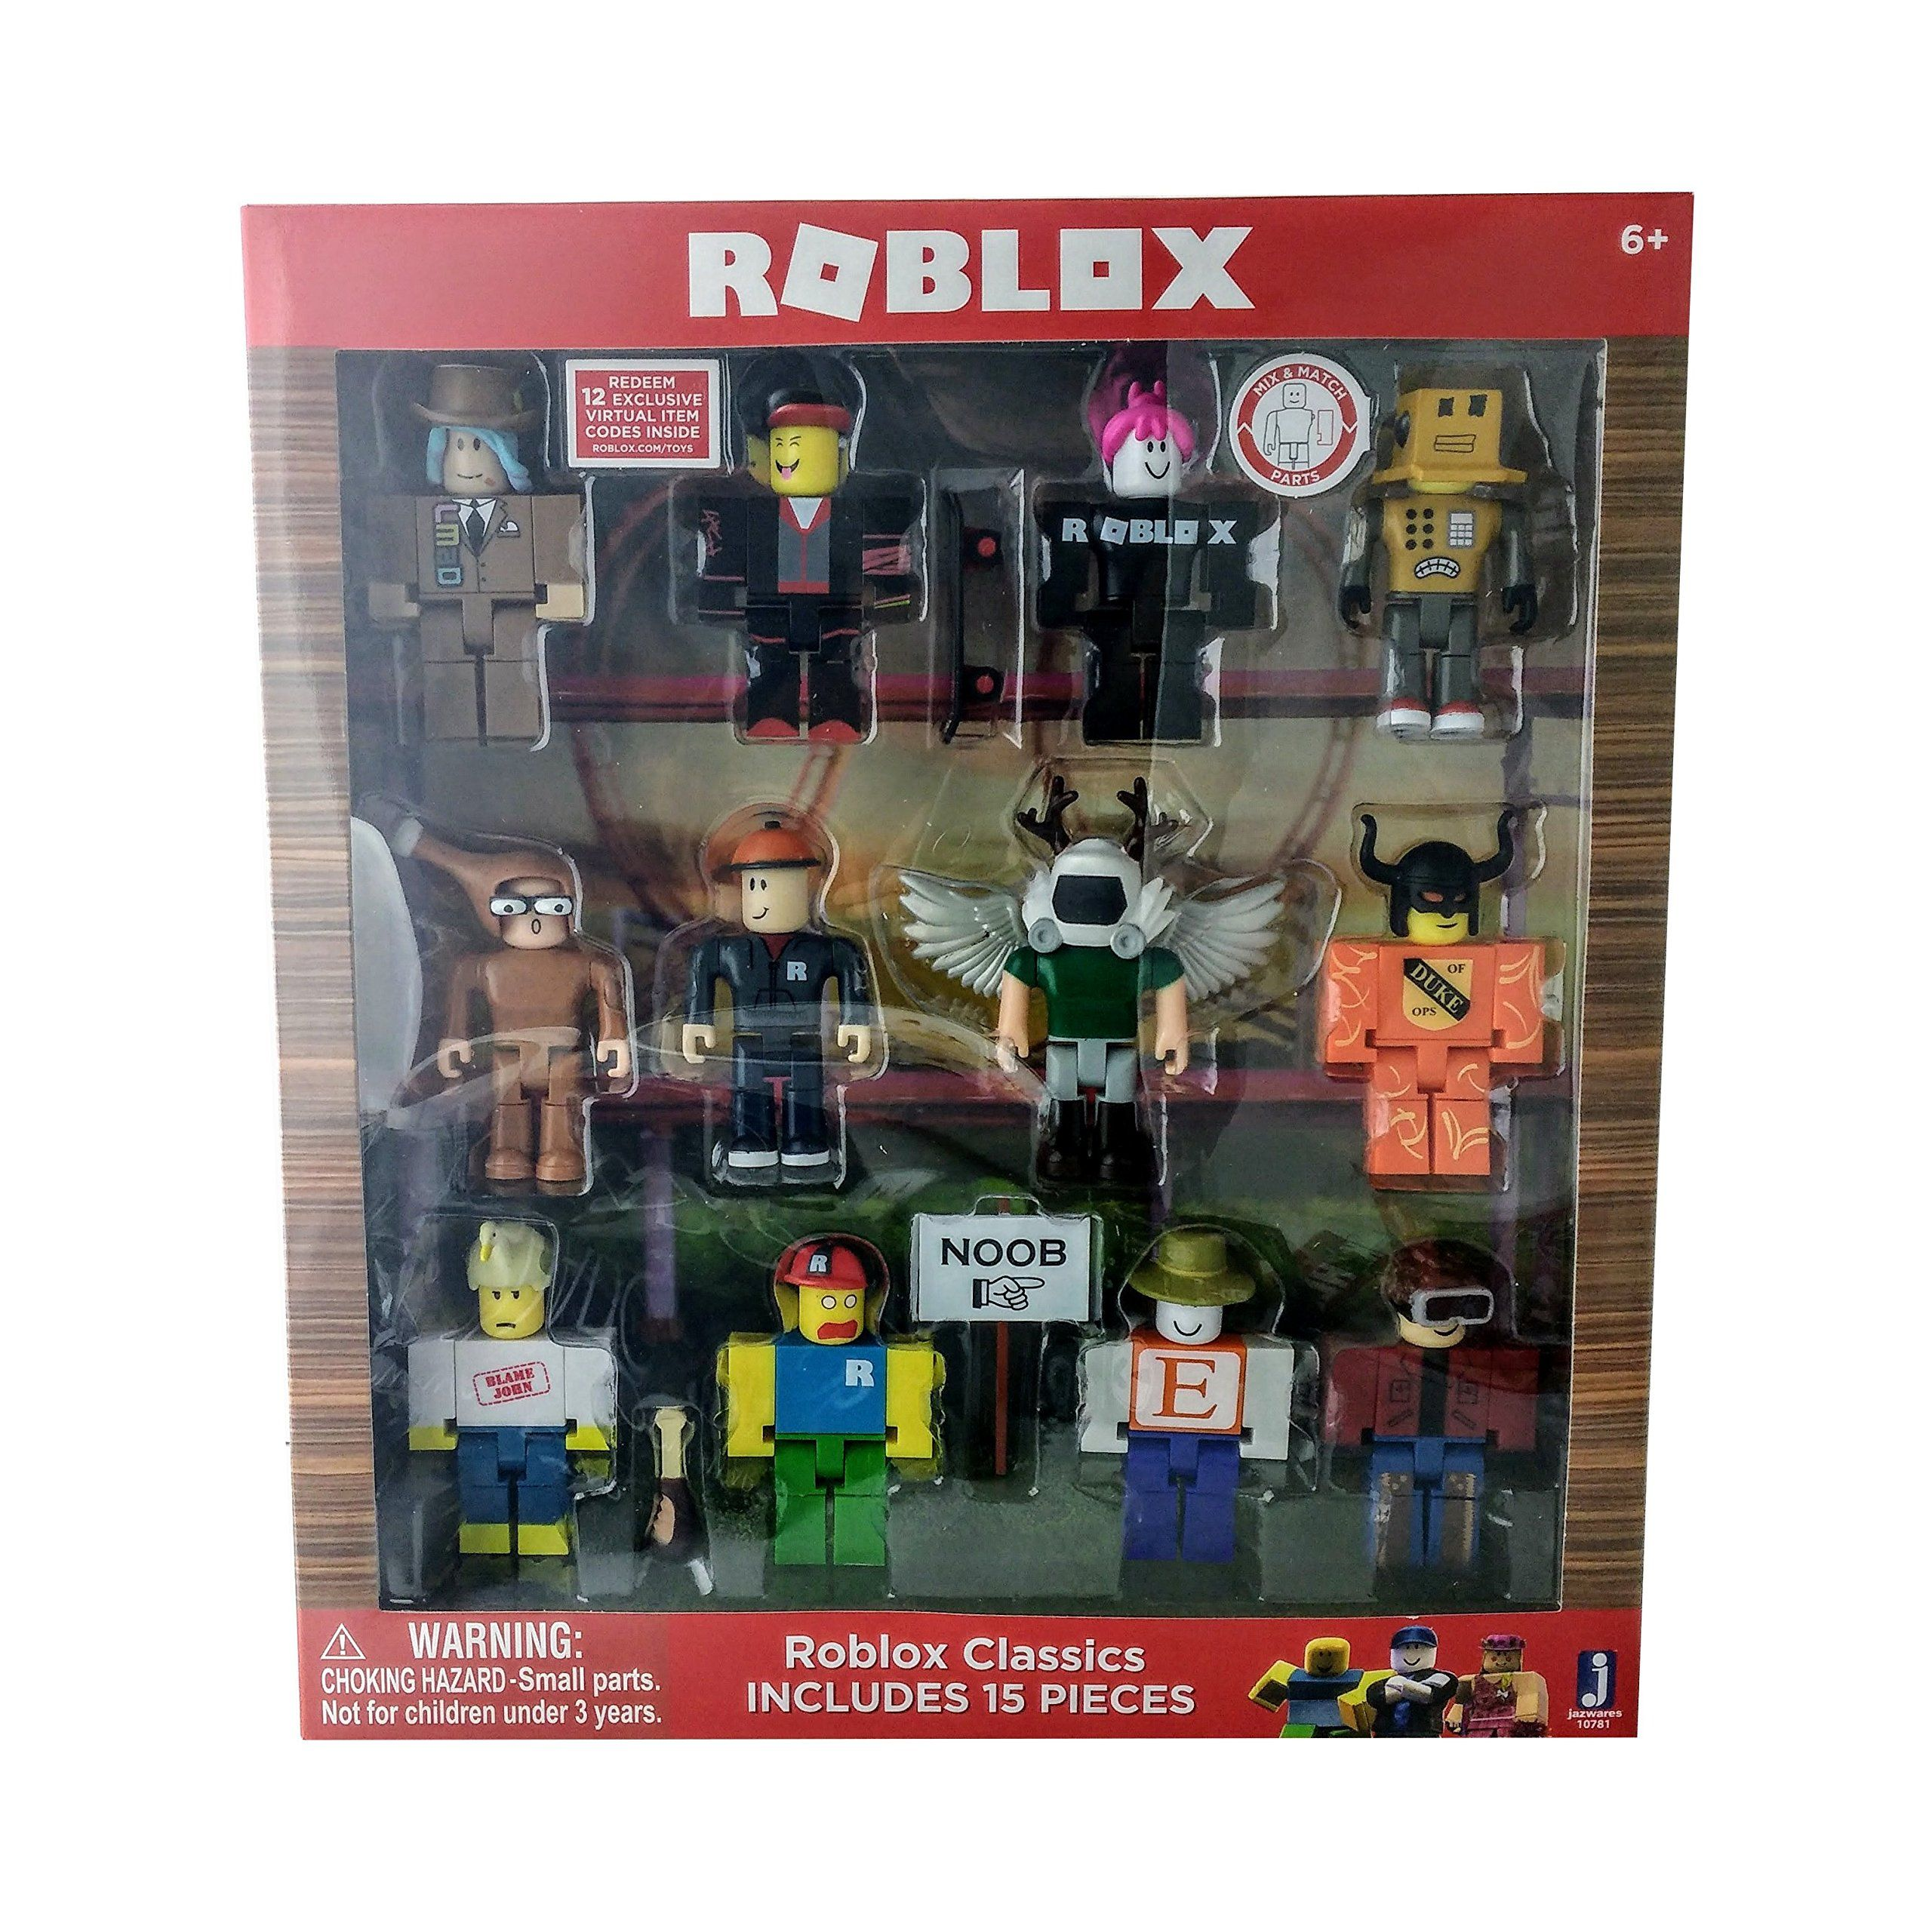 no code weapon ROBLOX game Series 1 Erik Cassel Robot Figure toy Xmas gift